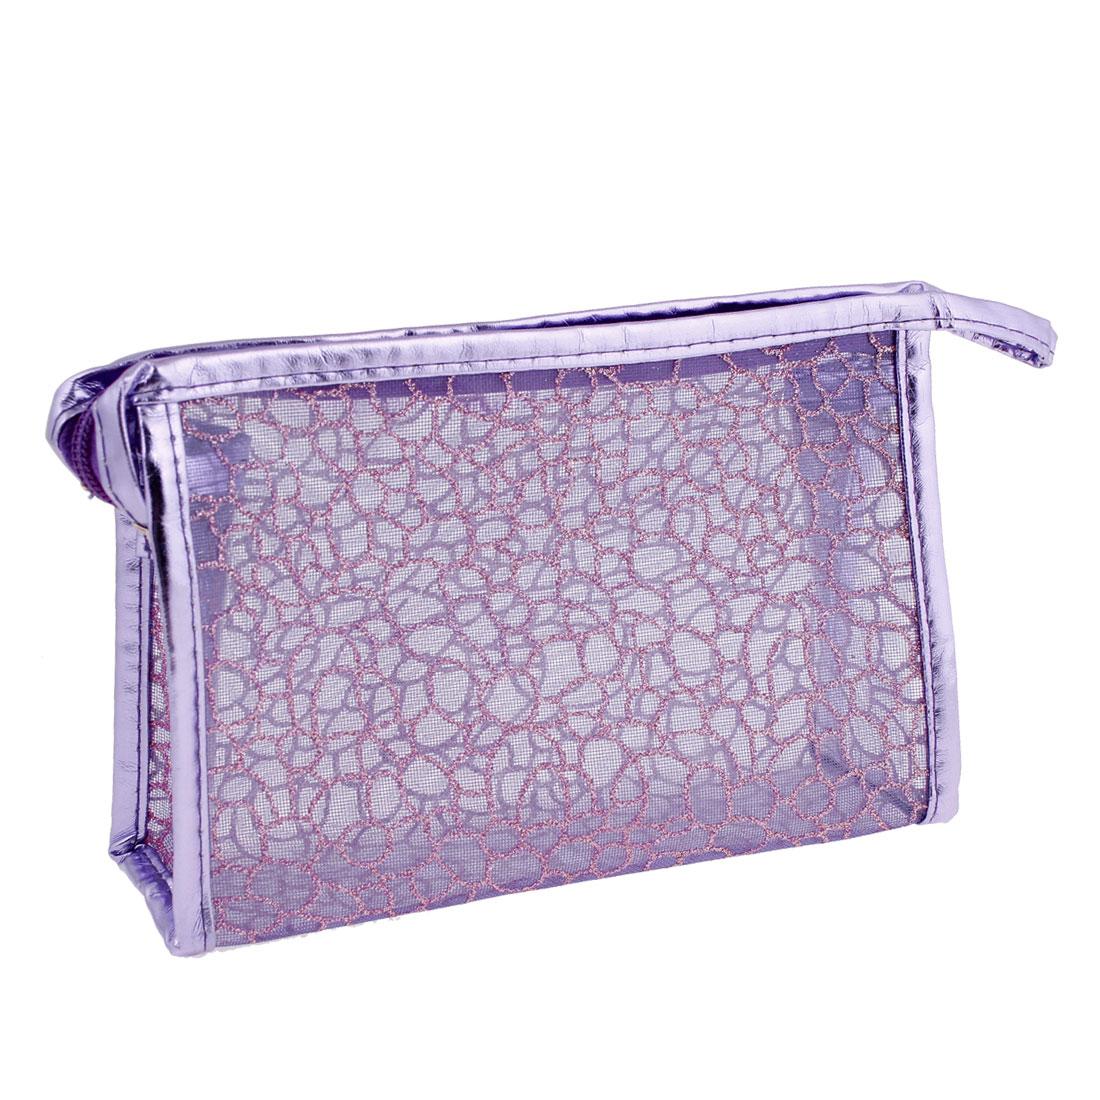 PVC Nylon Texture Zipper Closure Cosmetics Make Up Bag Purple for Ladies